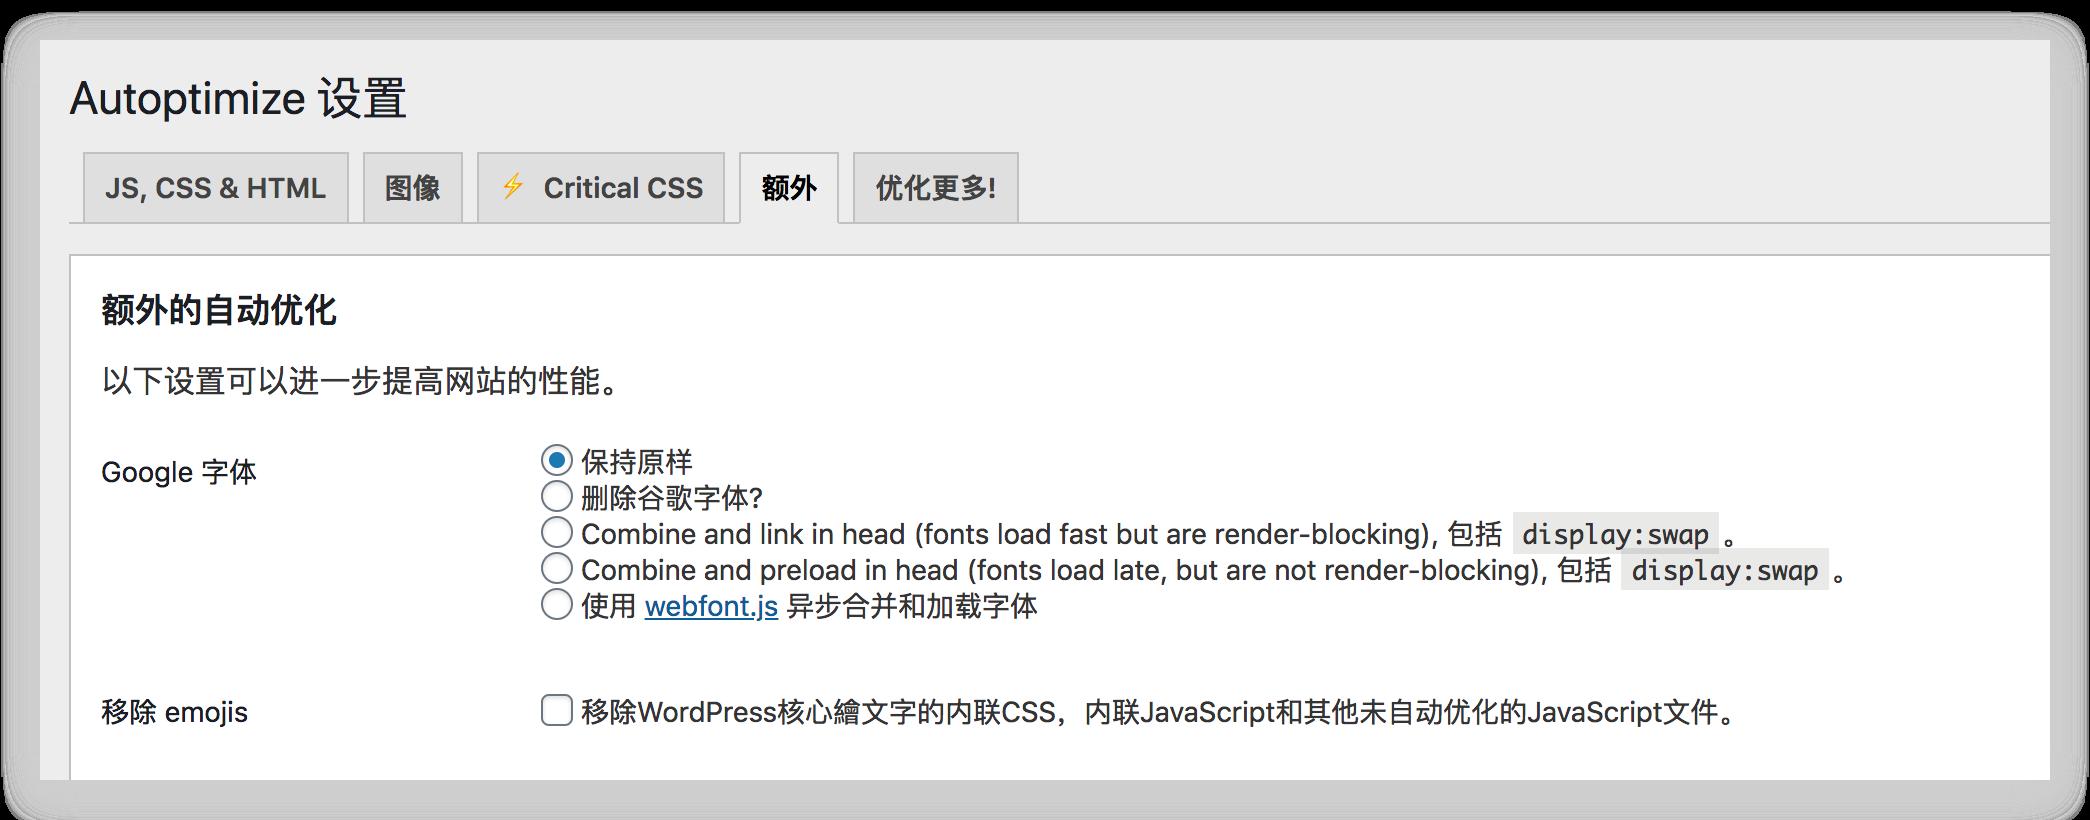 《WordPress优化指南-加快国内访问速度》